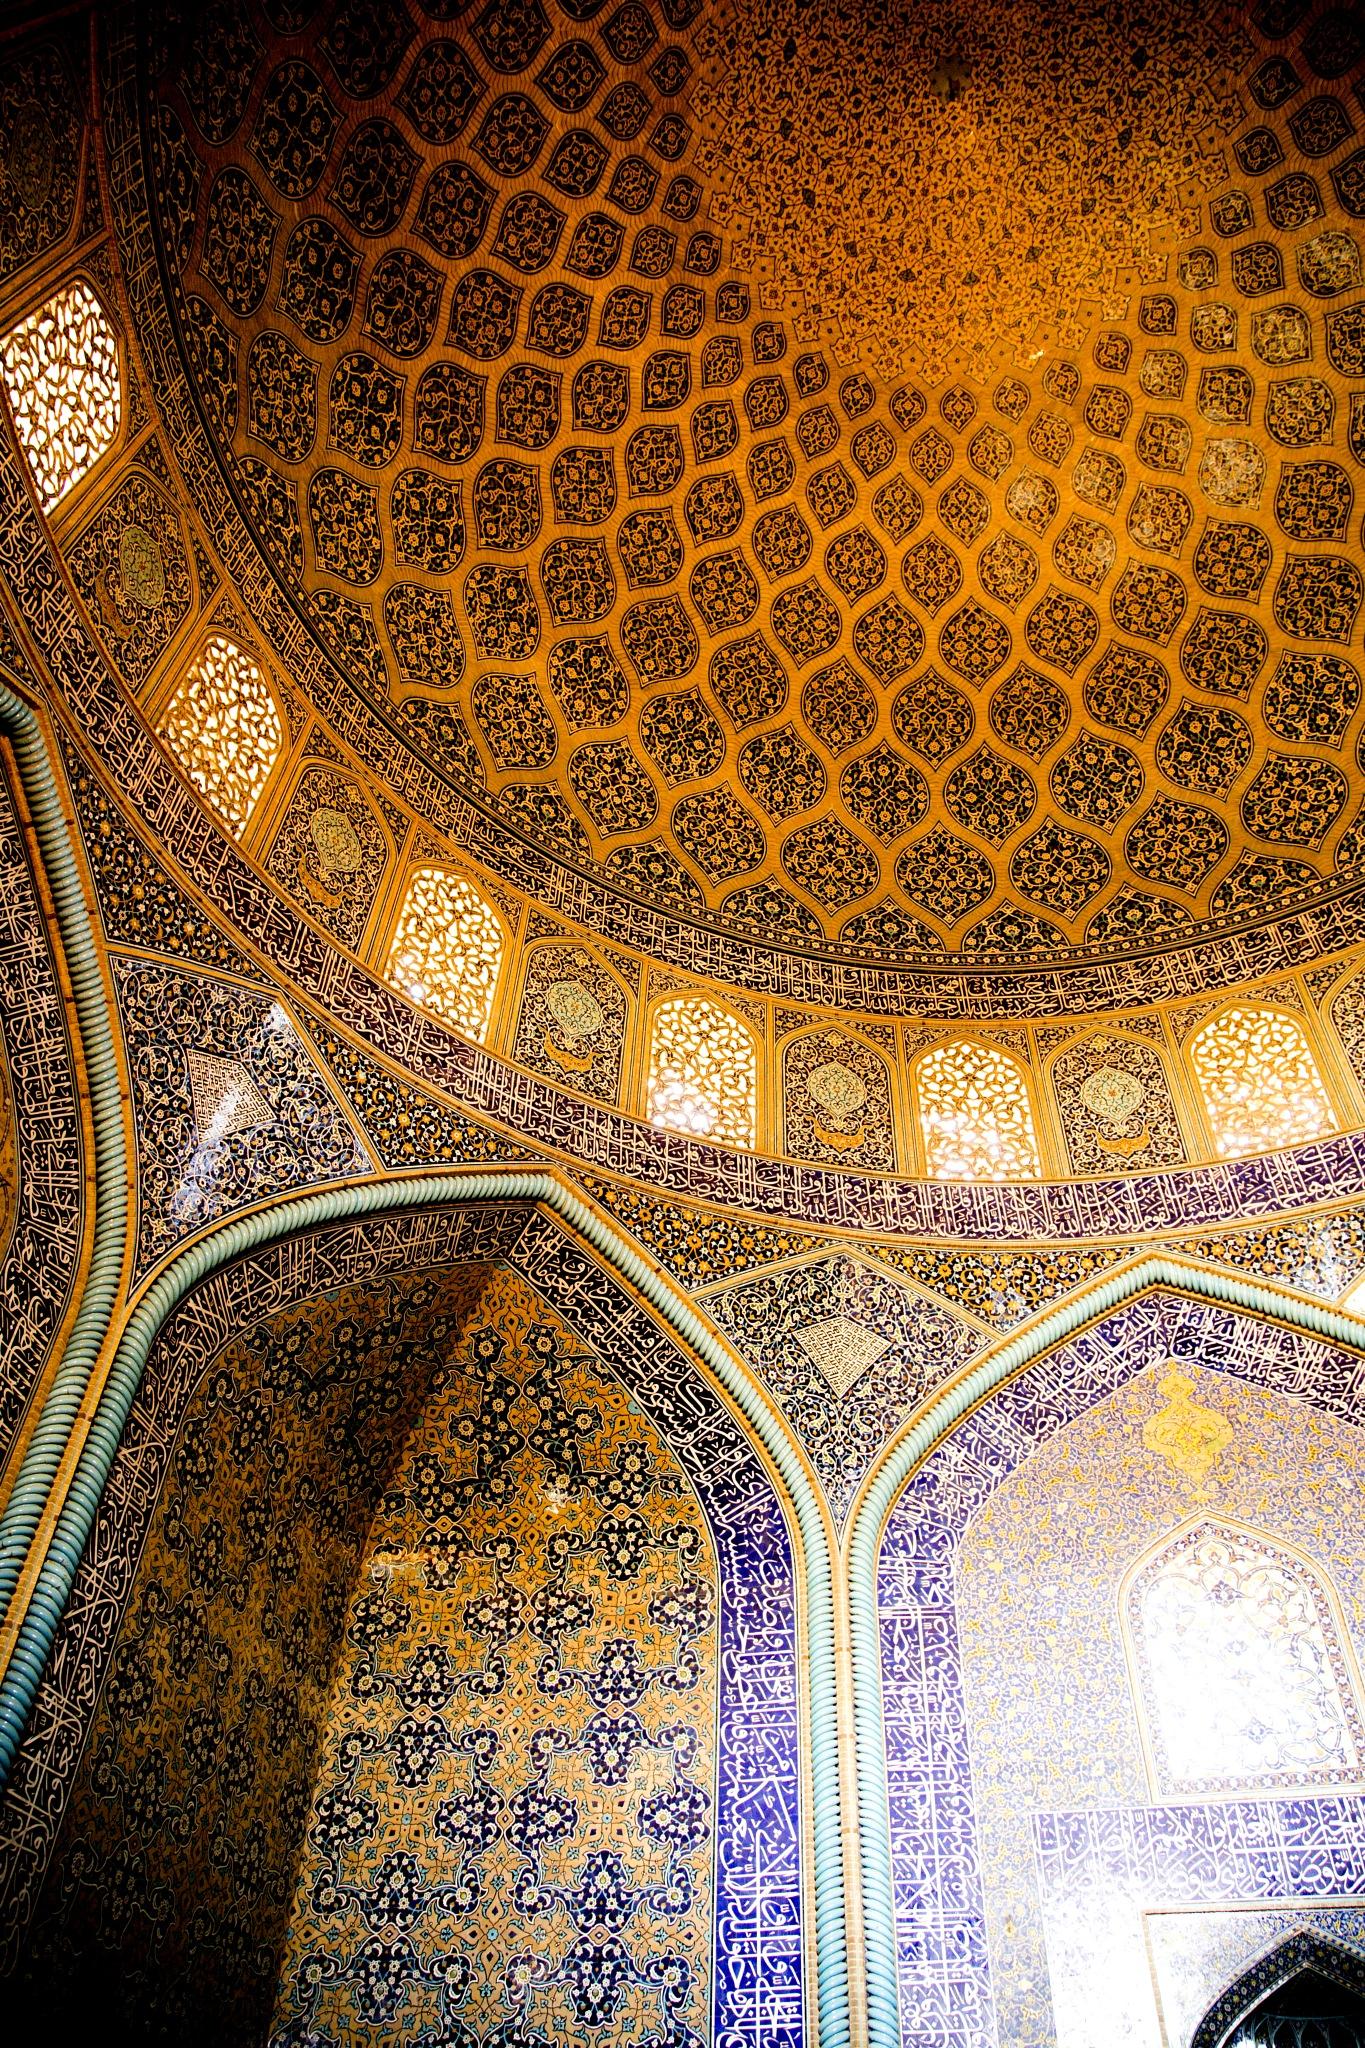 Sheykh Lotfollah mosque, Isfahan - مسجد شیخ لطف الله اصفهان by Babak Javid